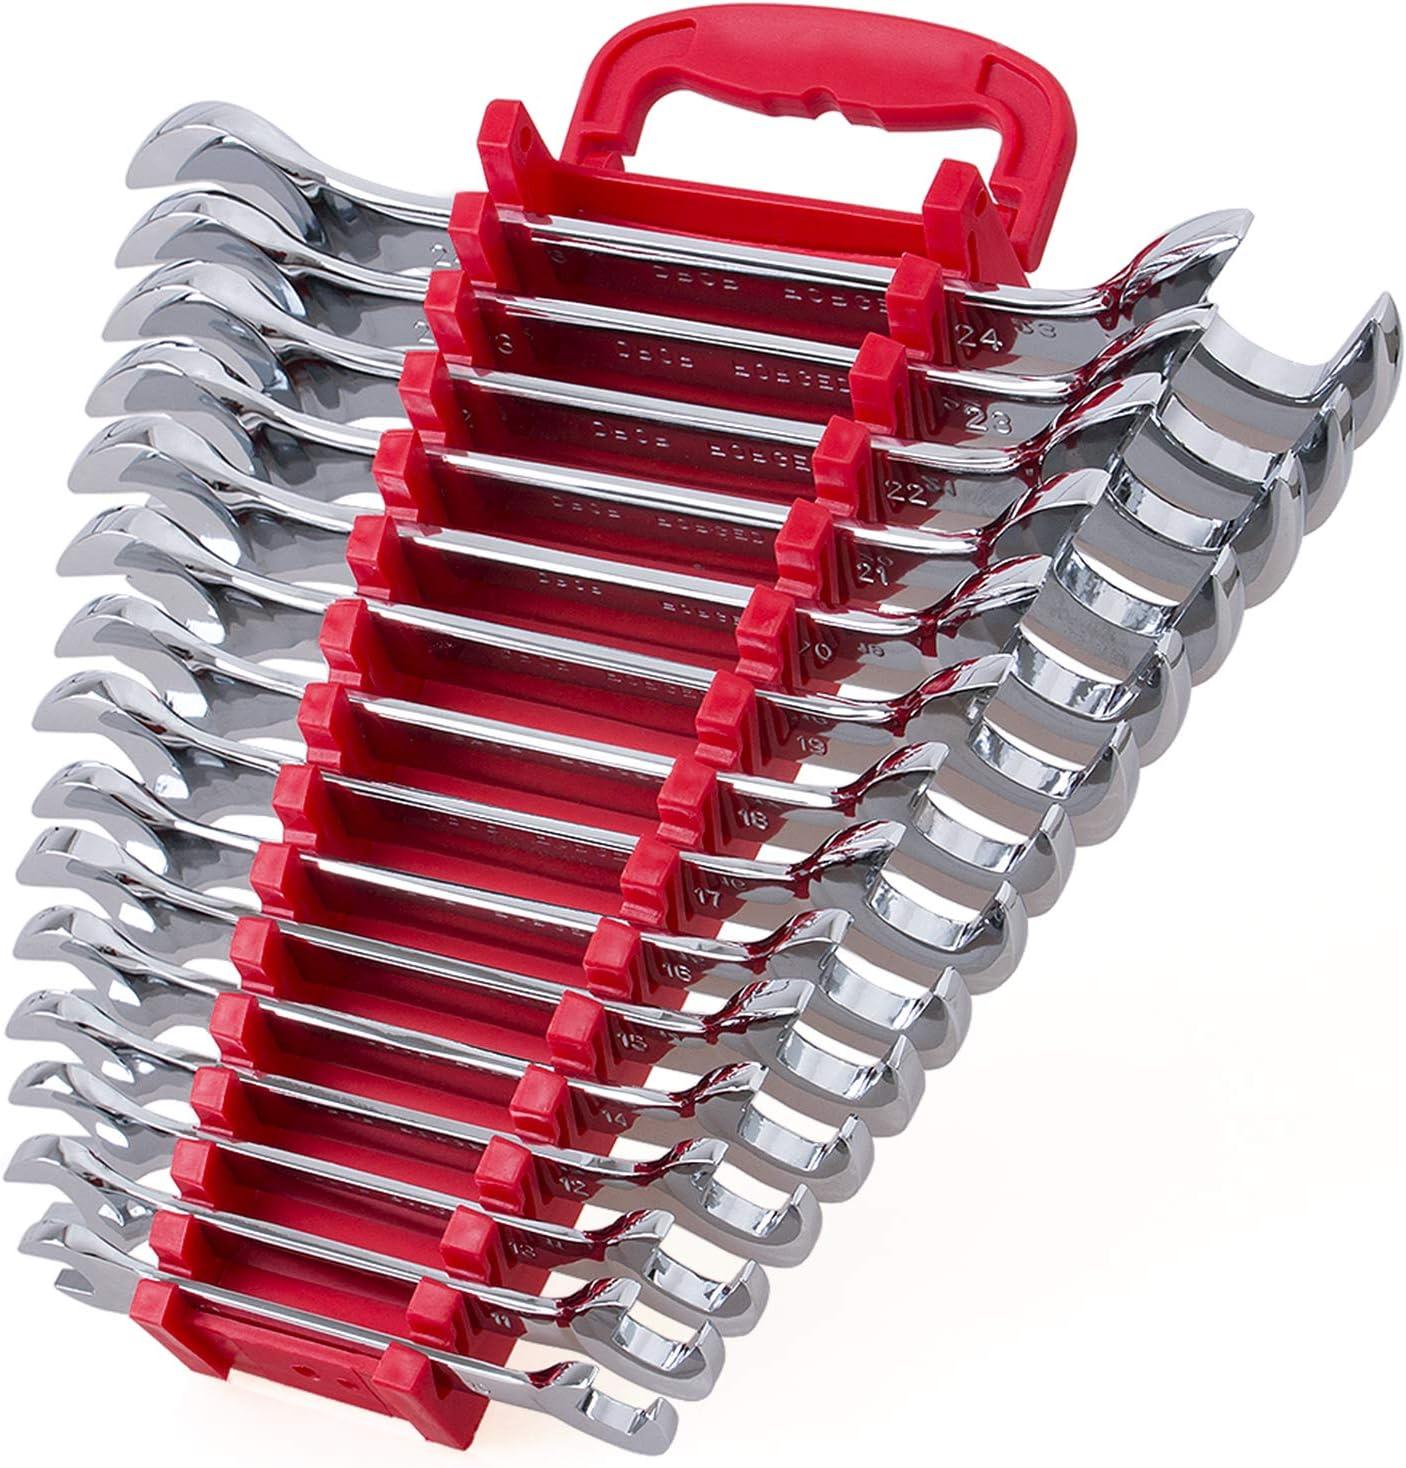 15 17 16 Include Metric Sizes 10 Chrome Vanadium Steel 20 13 11 14 Mirror Chrome Finish 24mm with Storage Rack 22 21 12 15-Piece Premium Angle Head Open End Wrench Set 23 19 18